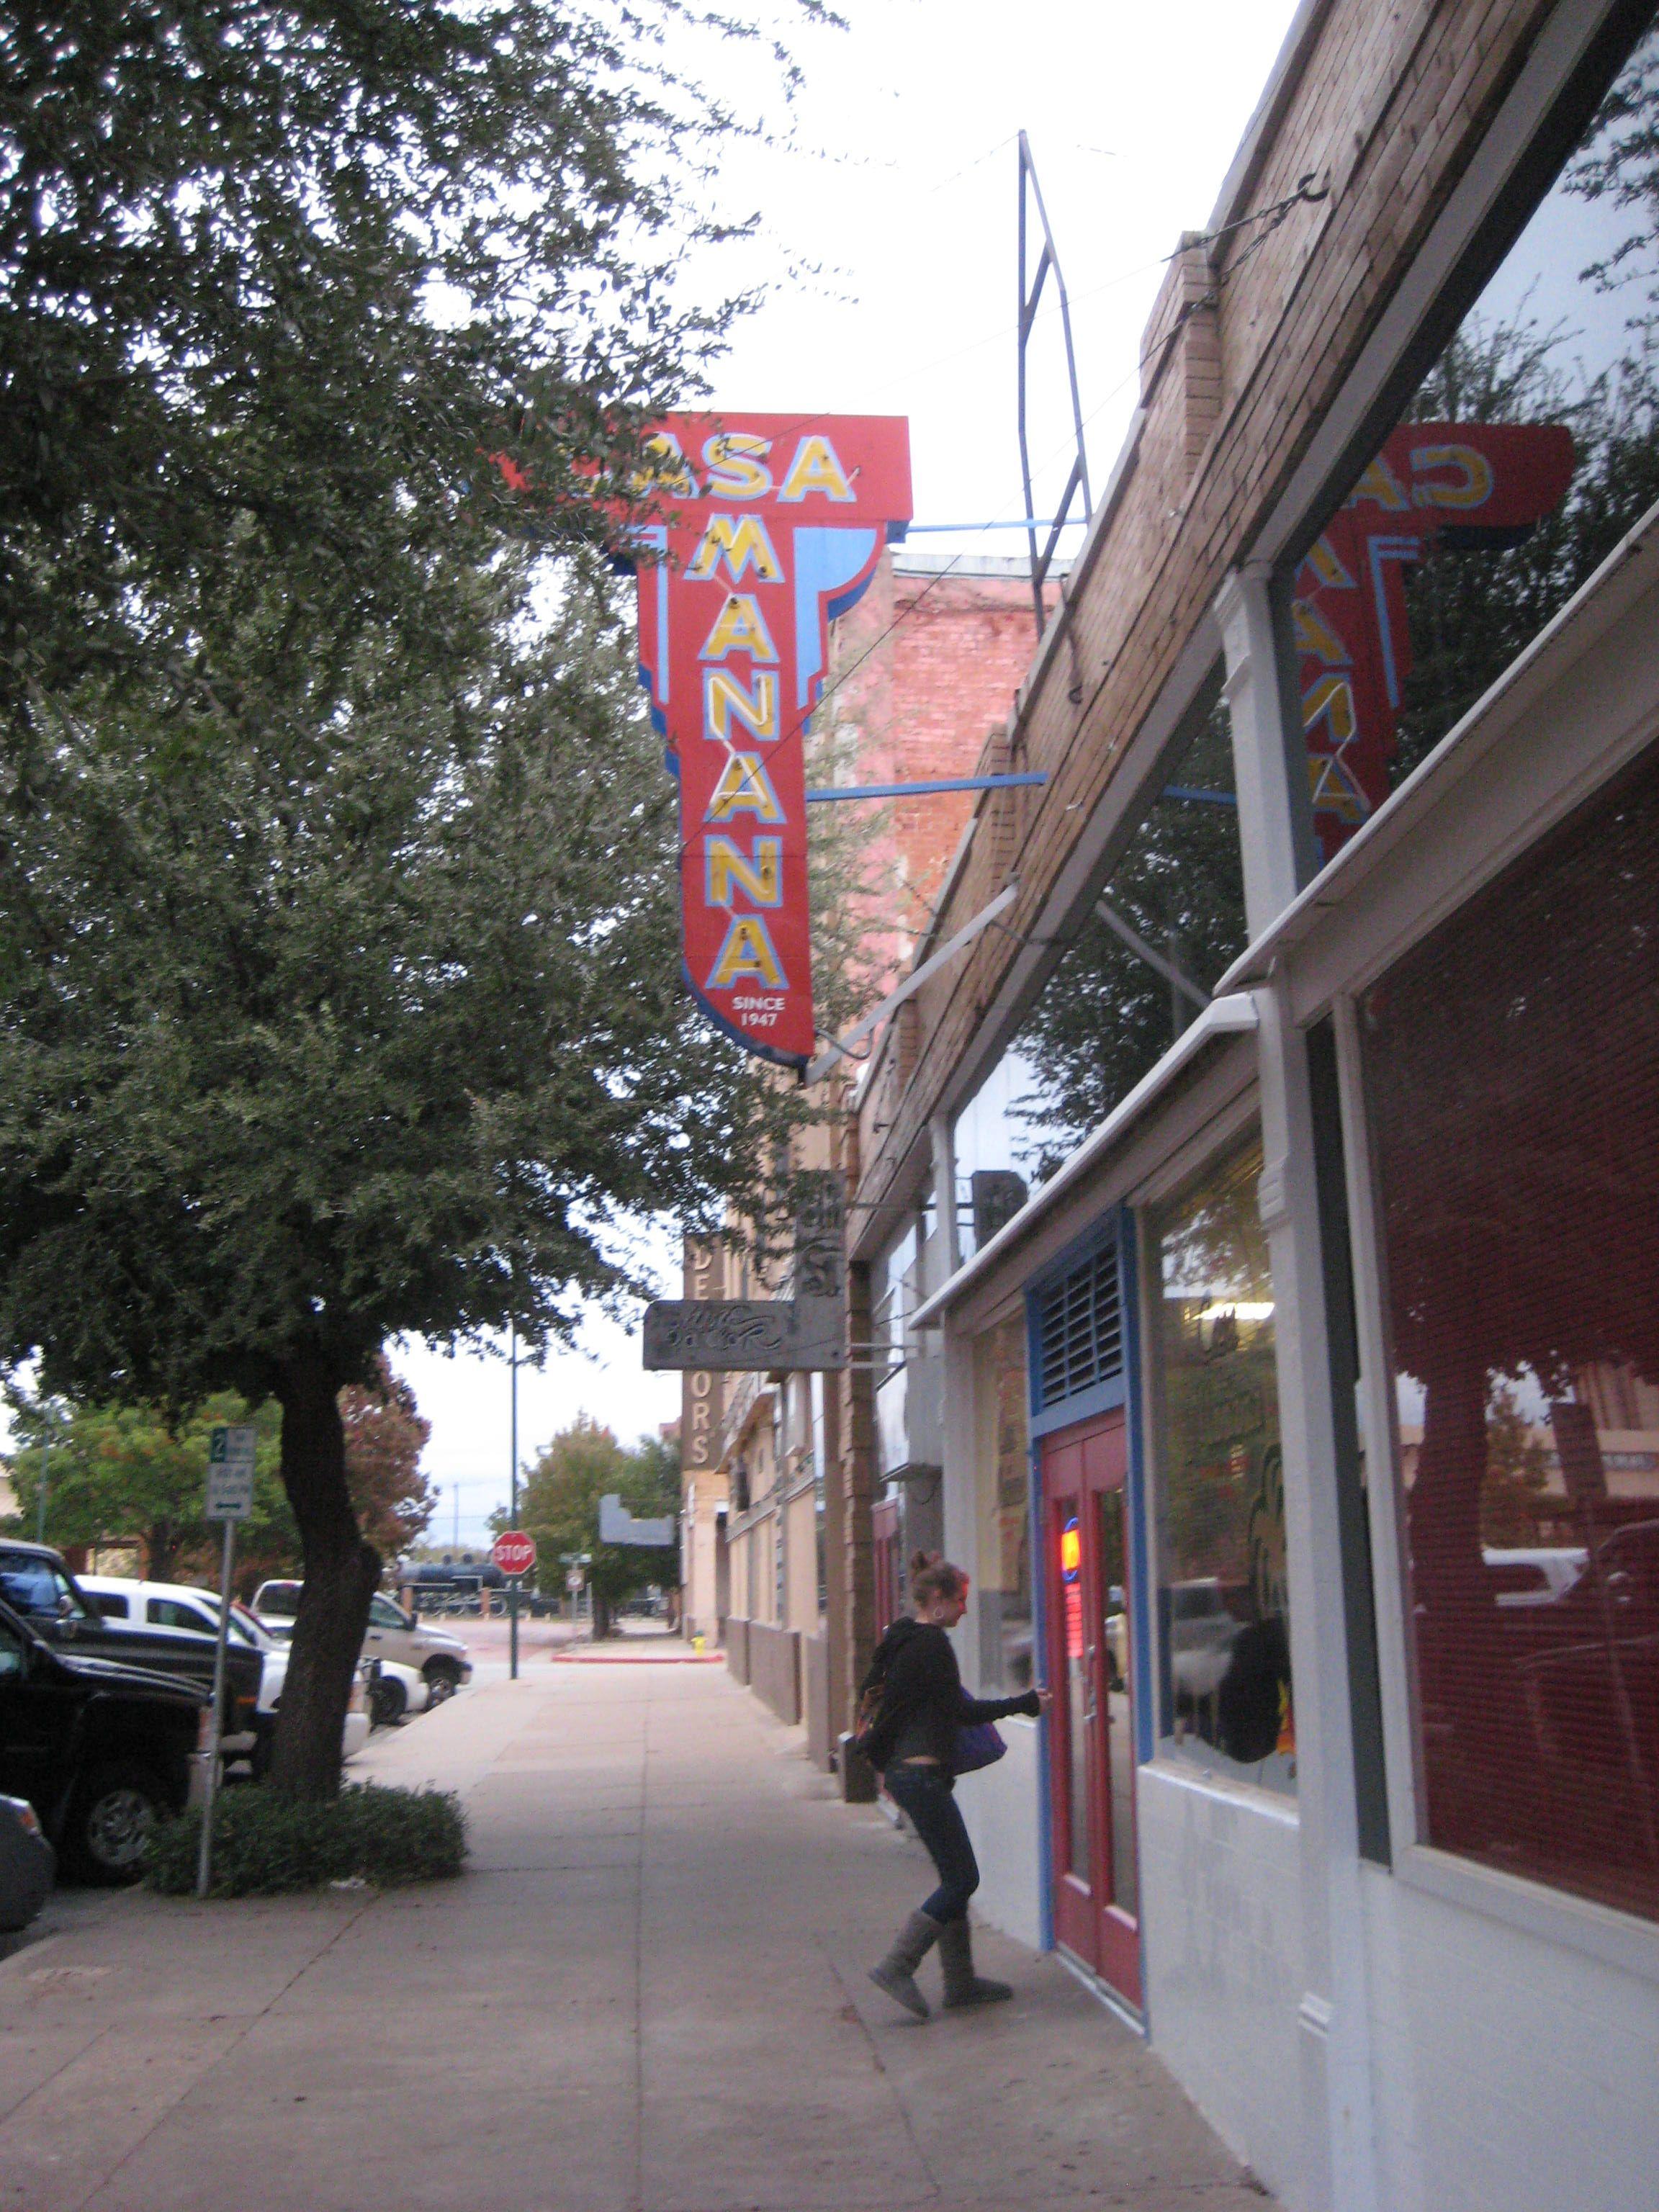 Downtown Wichita Falls Wichita Falls Most Beautiful Cities Travel Memories